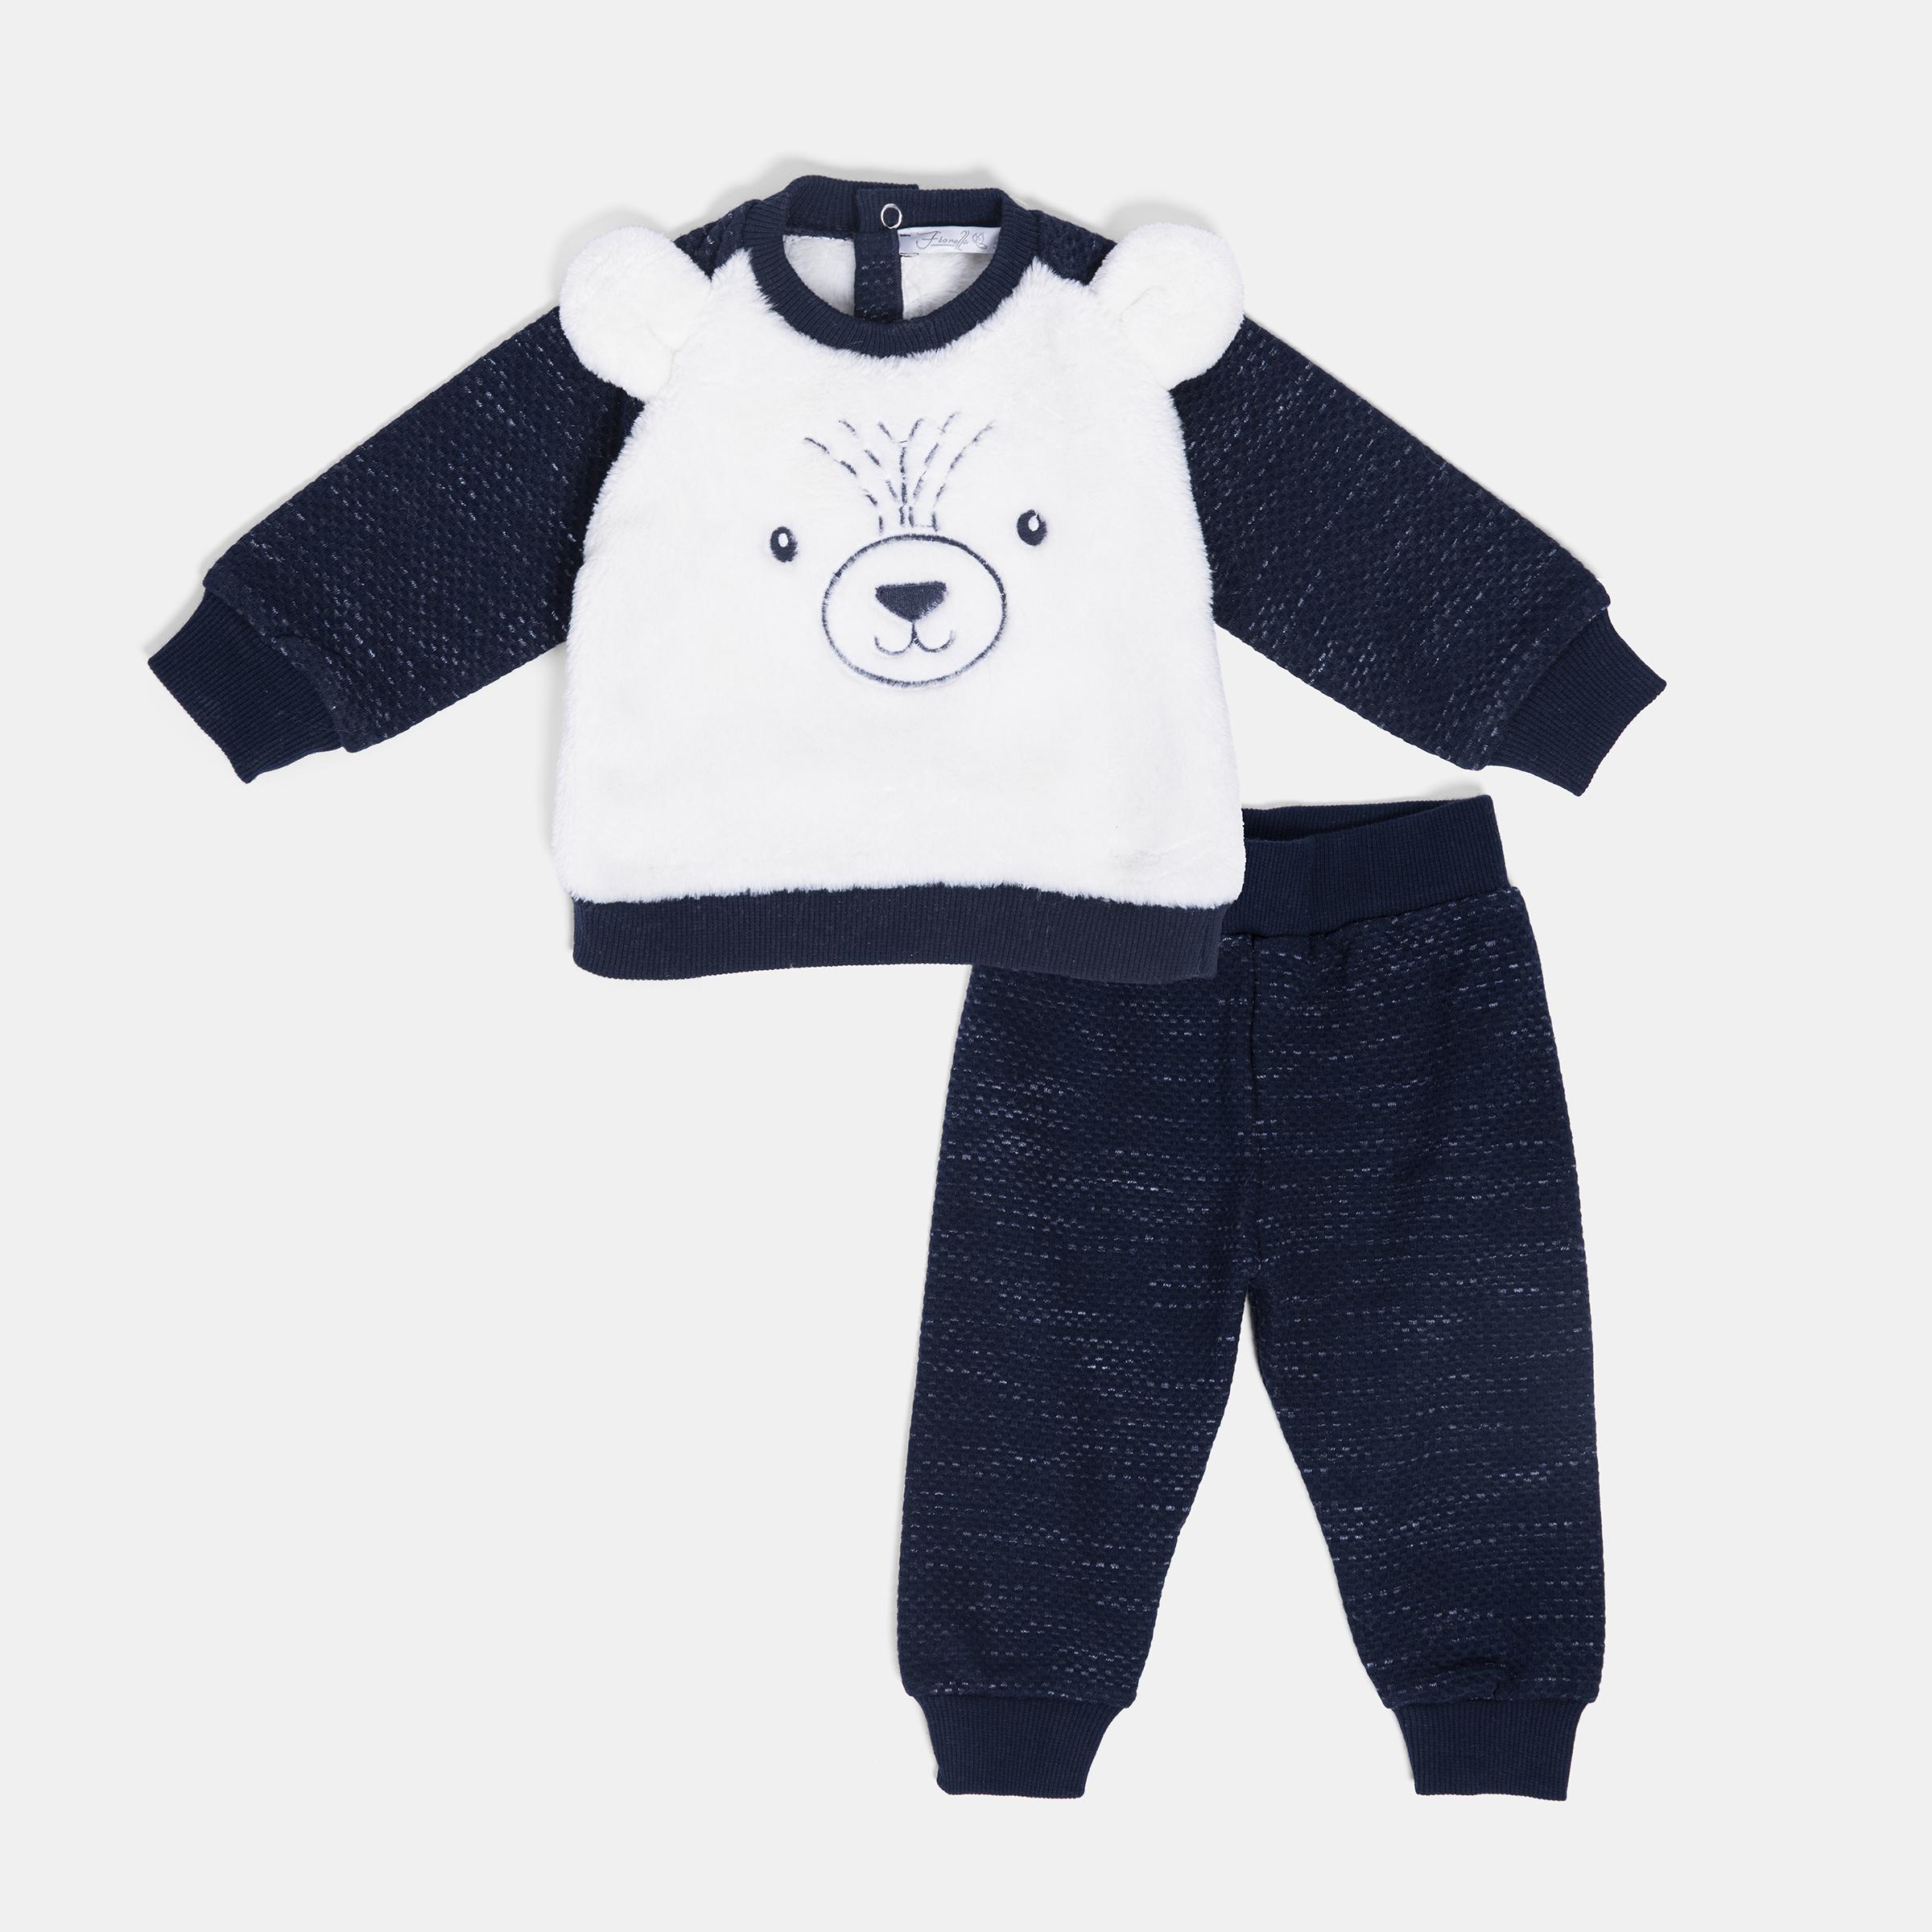 ست سویشرت و شلوار نوزادی پسرانه فیورلا مدل خرس قطبی کد 20506